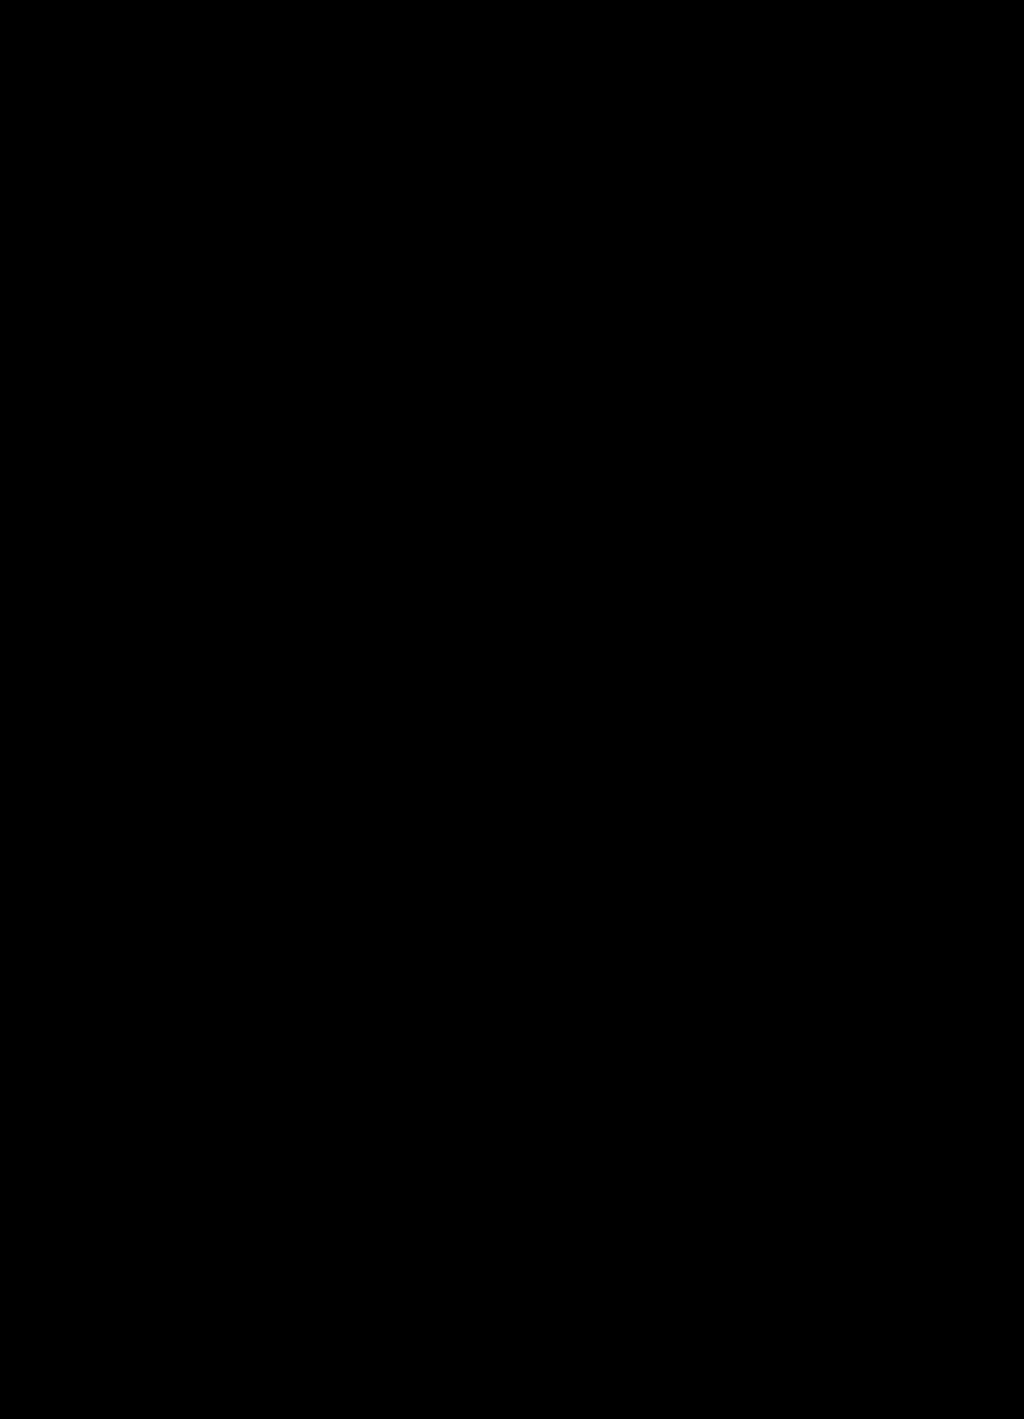 Free Spiderman Logo Black And White, Download Free Clip Art.